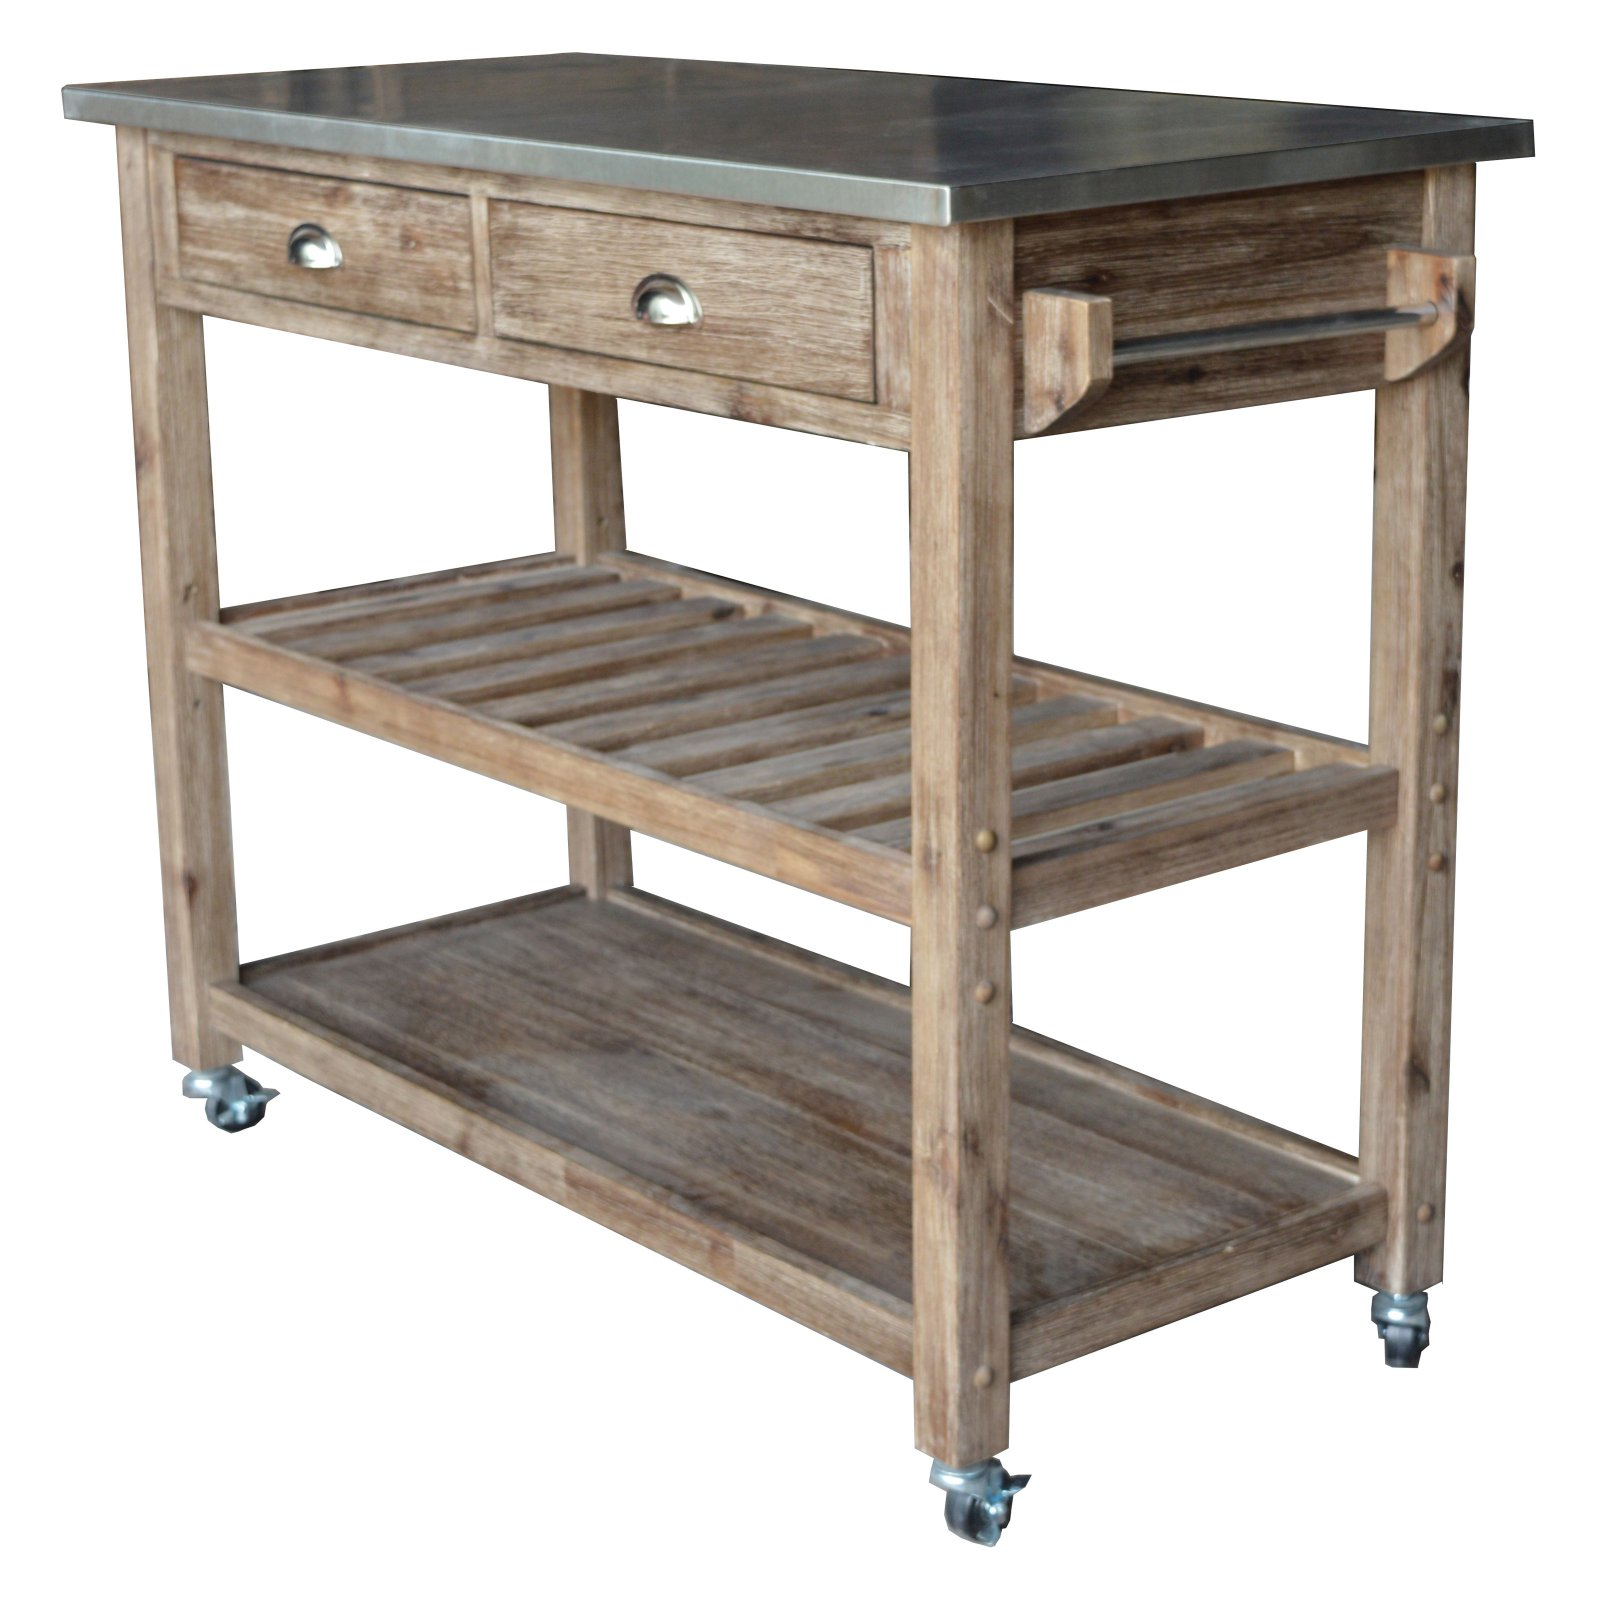 kitchen cart table moen oil rubbed bronze faucet boraam industries sonoma wire brush gray finish walmart com